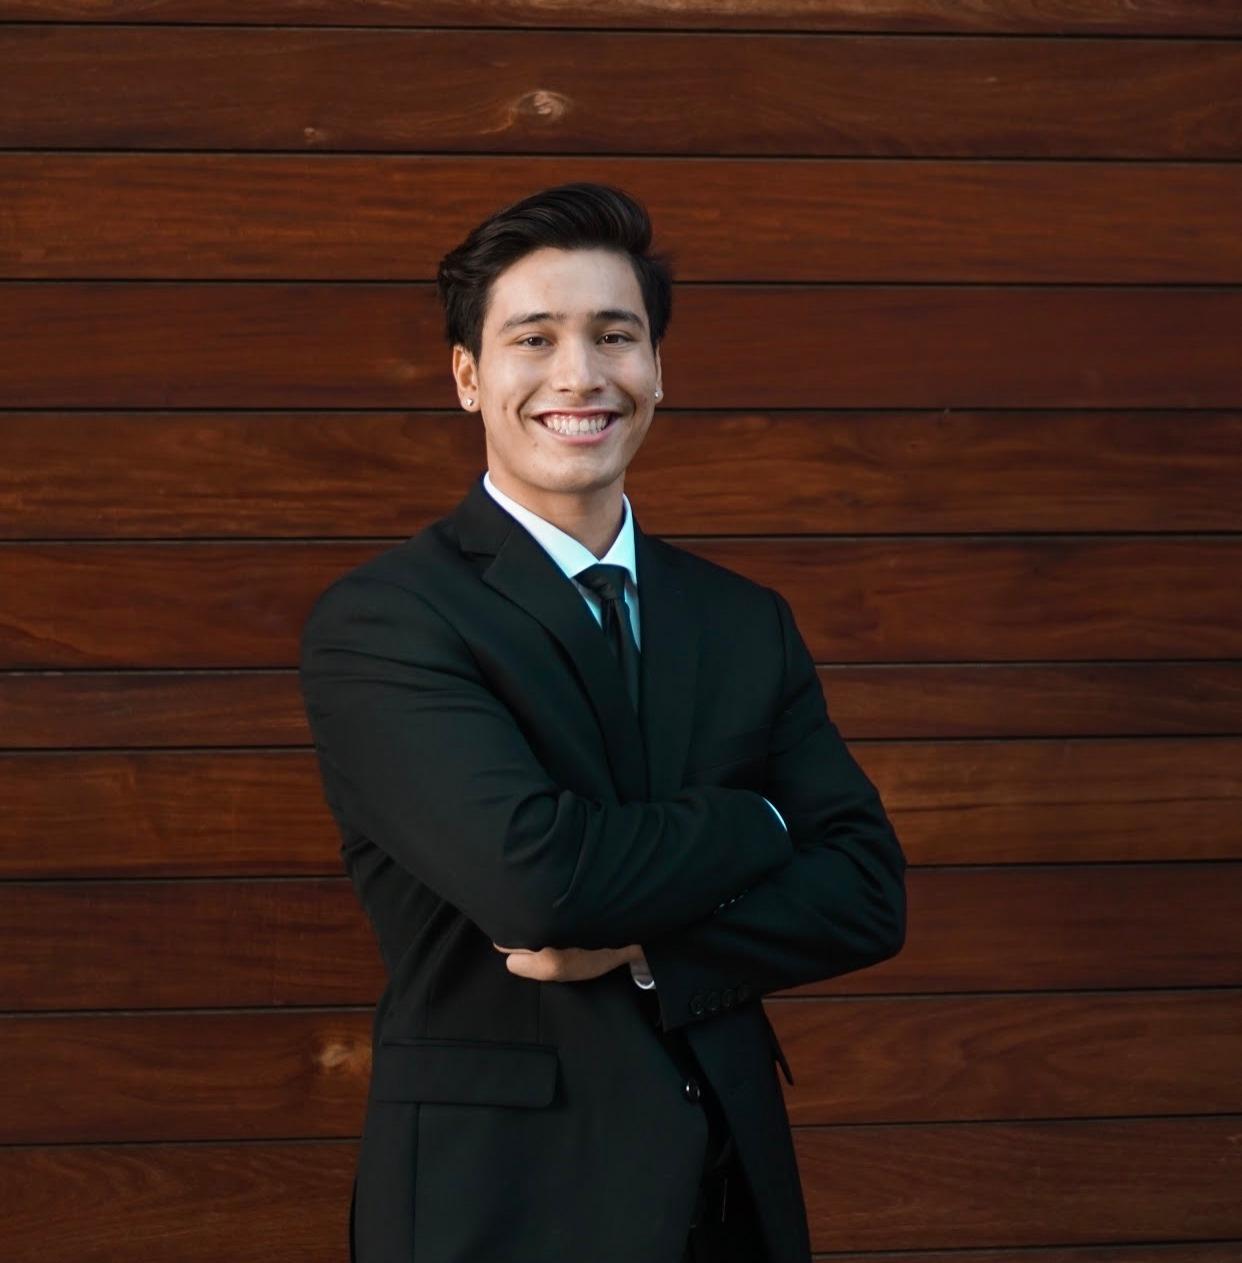 Brandon McDonald - Marketing Intern